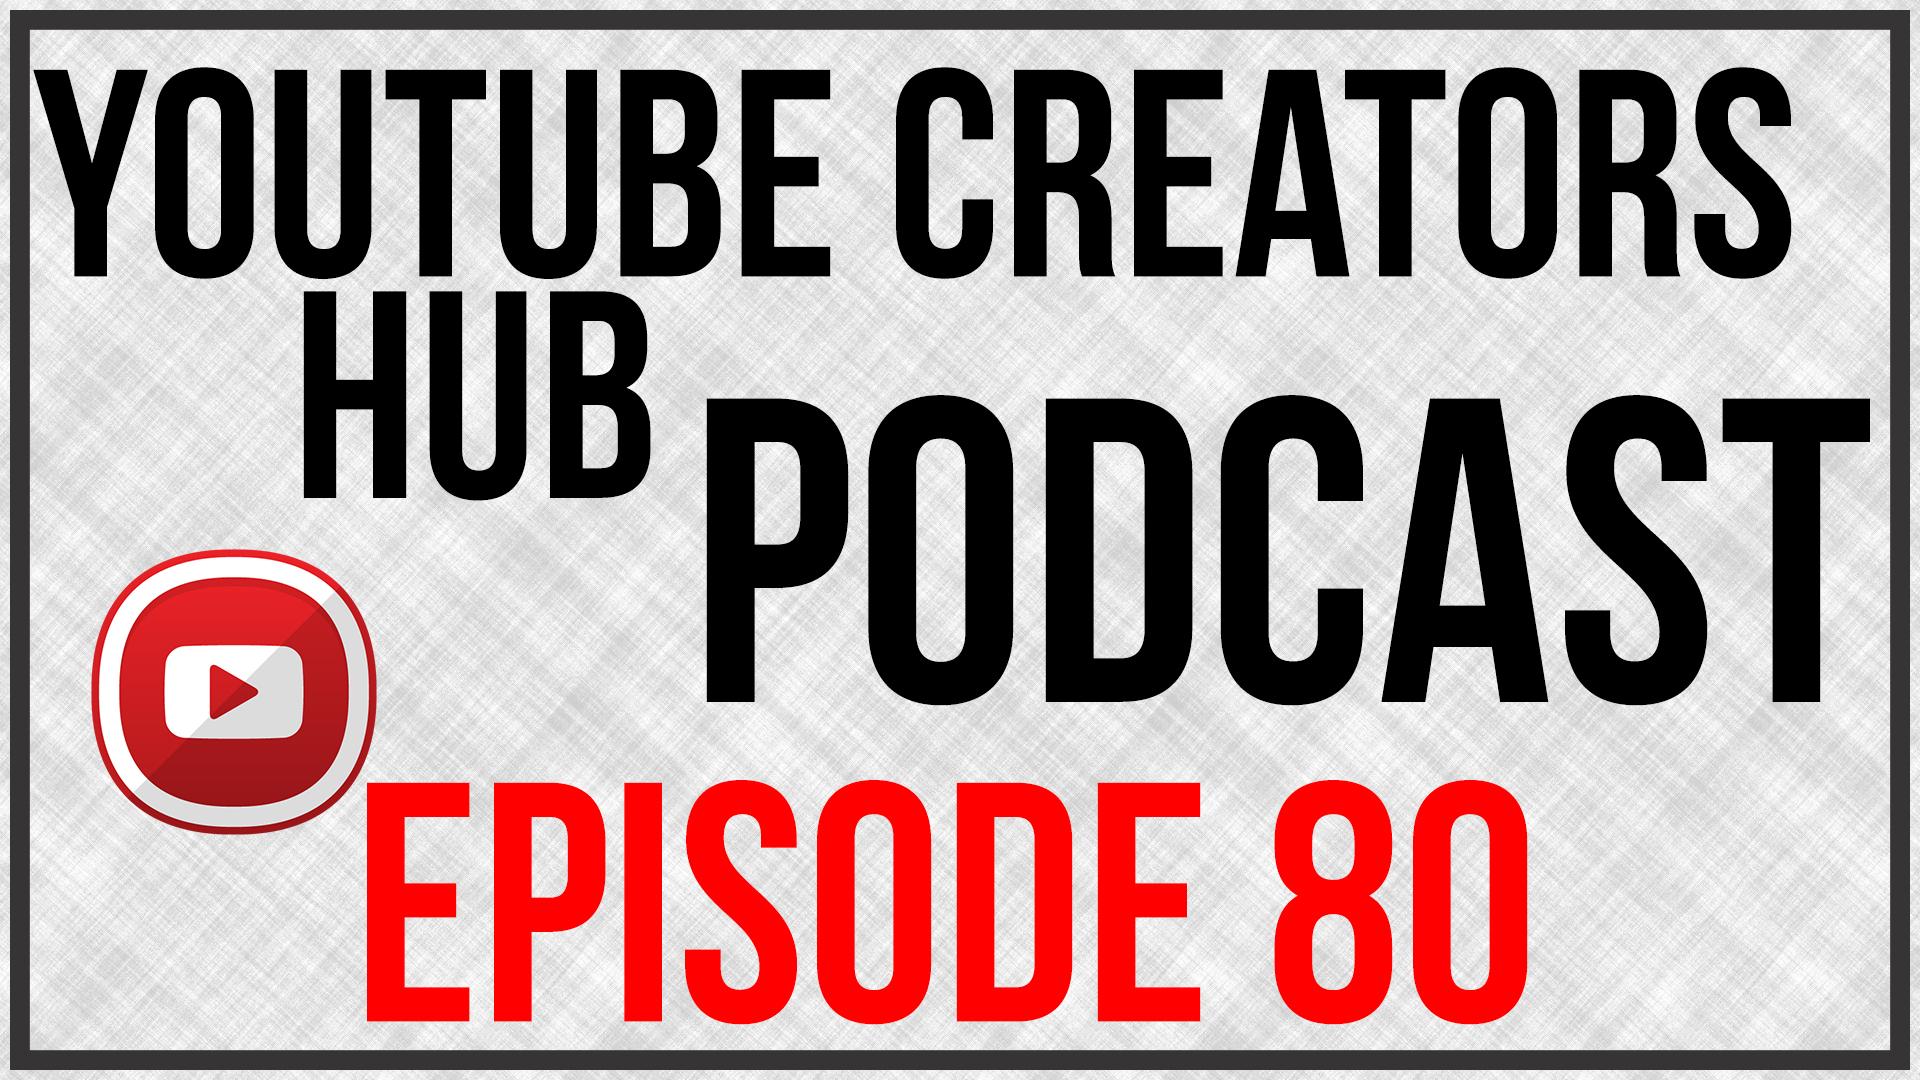 YouTube Creators Hub Podcast Episode 80